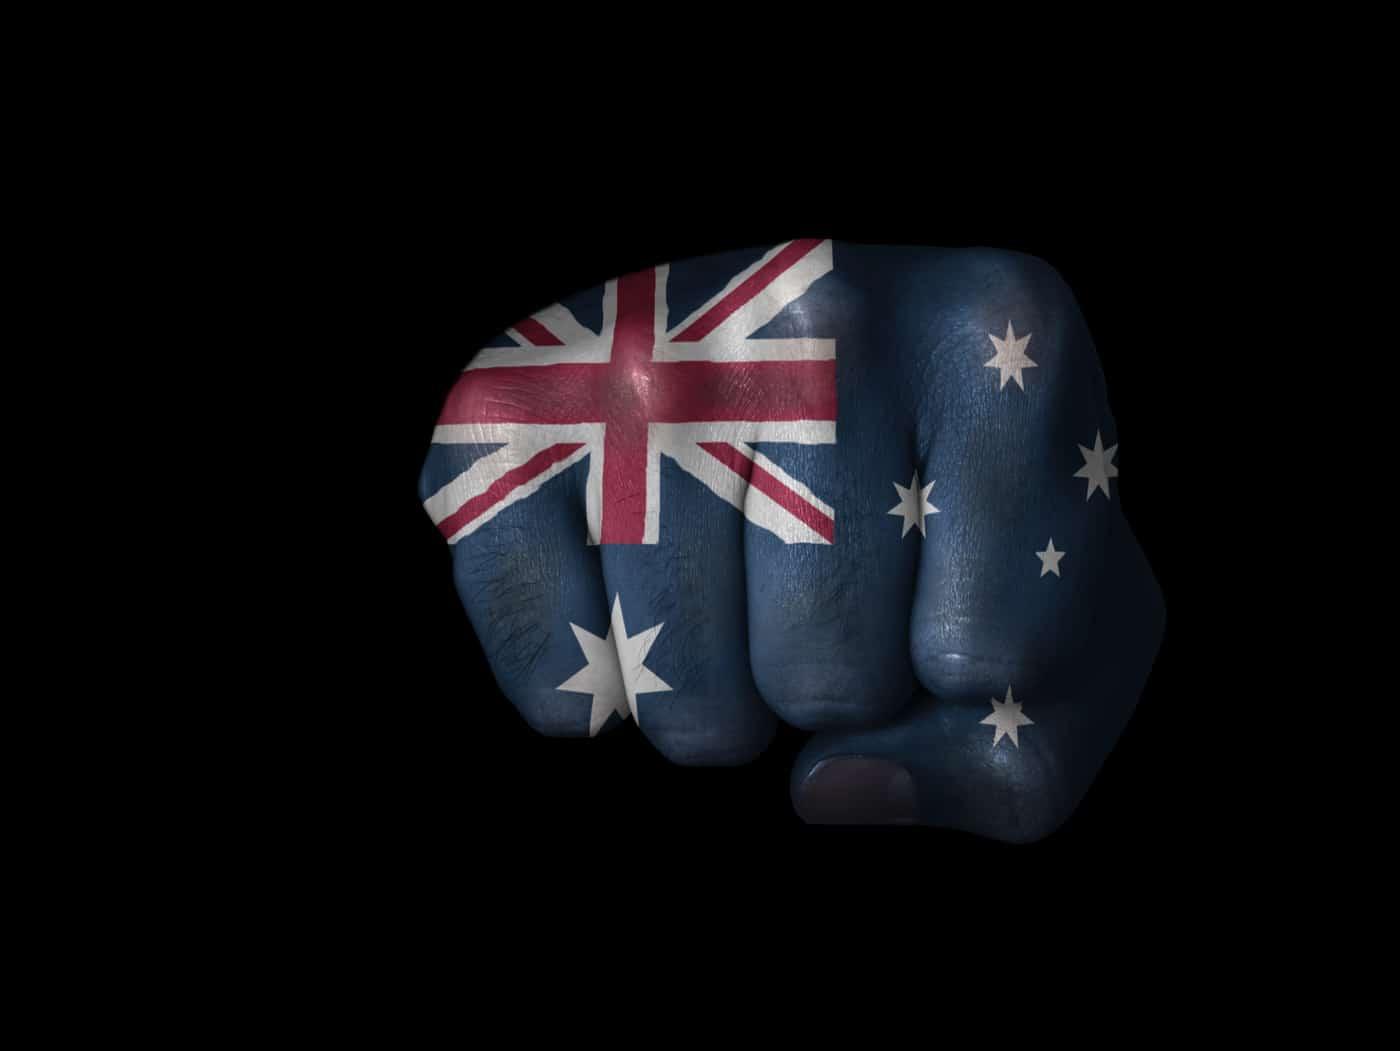 Politics on display in final report of Australia's